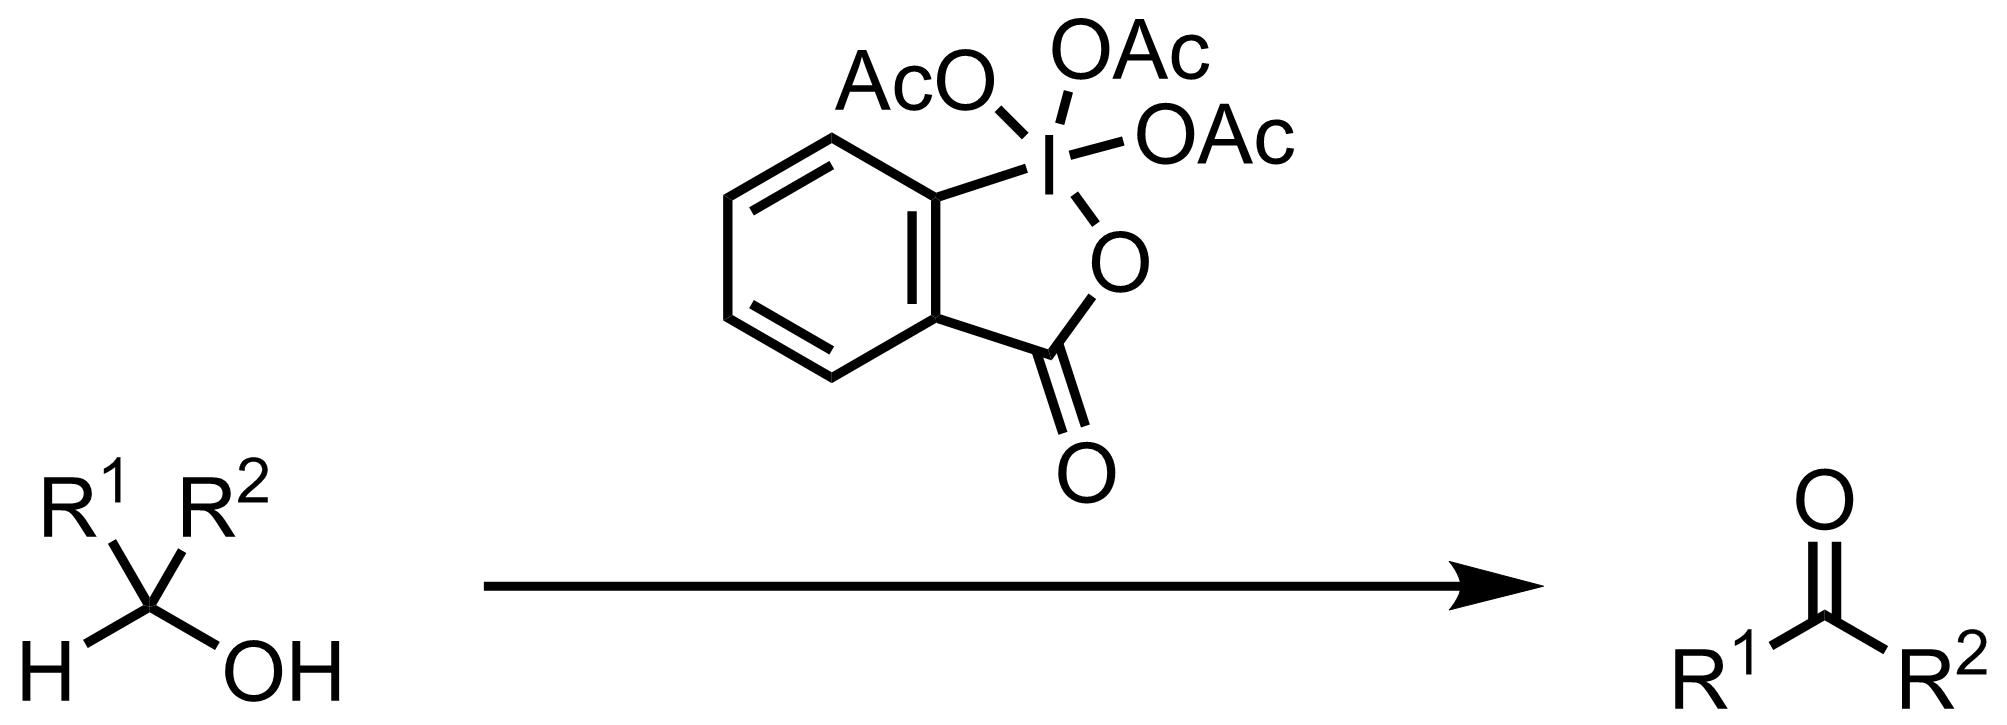 Schematic representation of the Dess-Martin Oxidation.